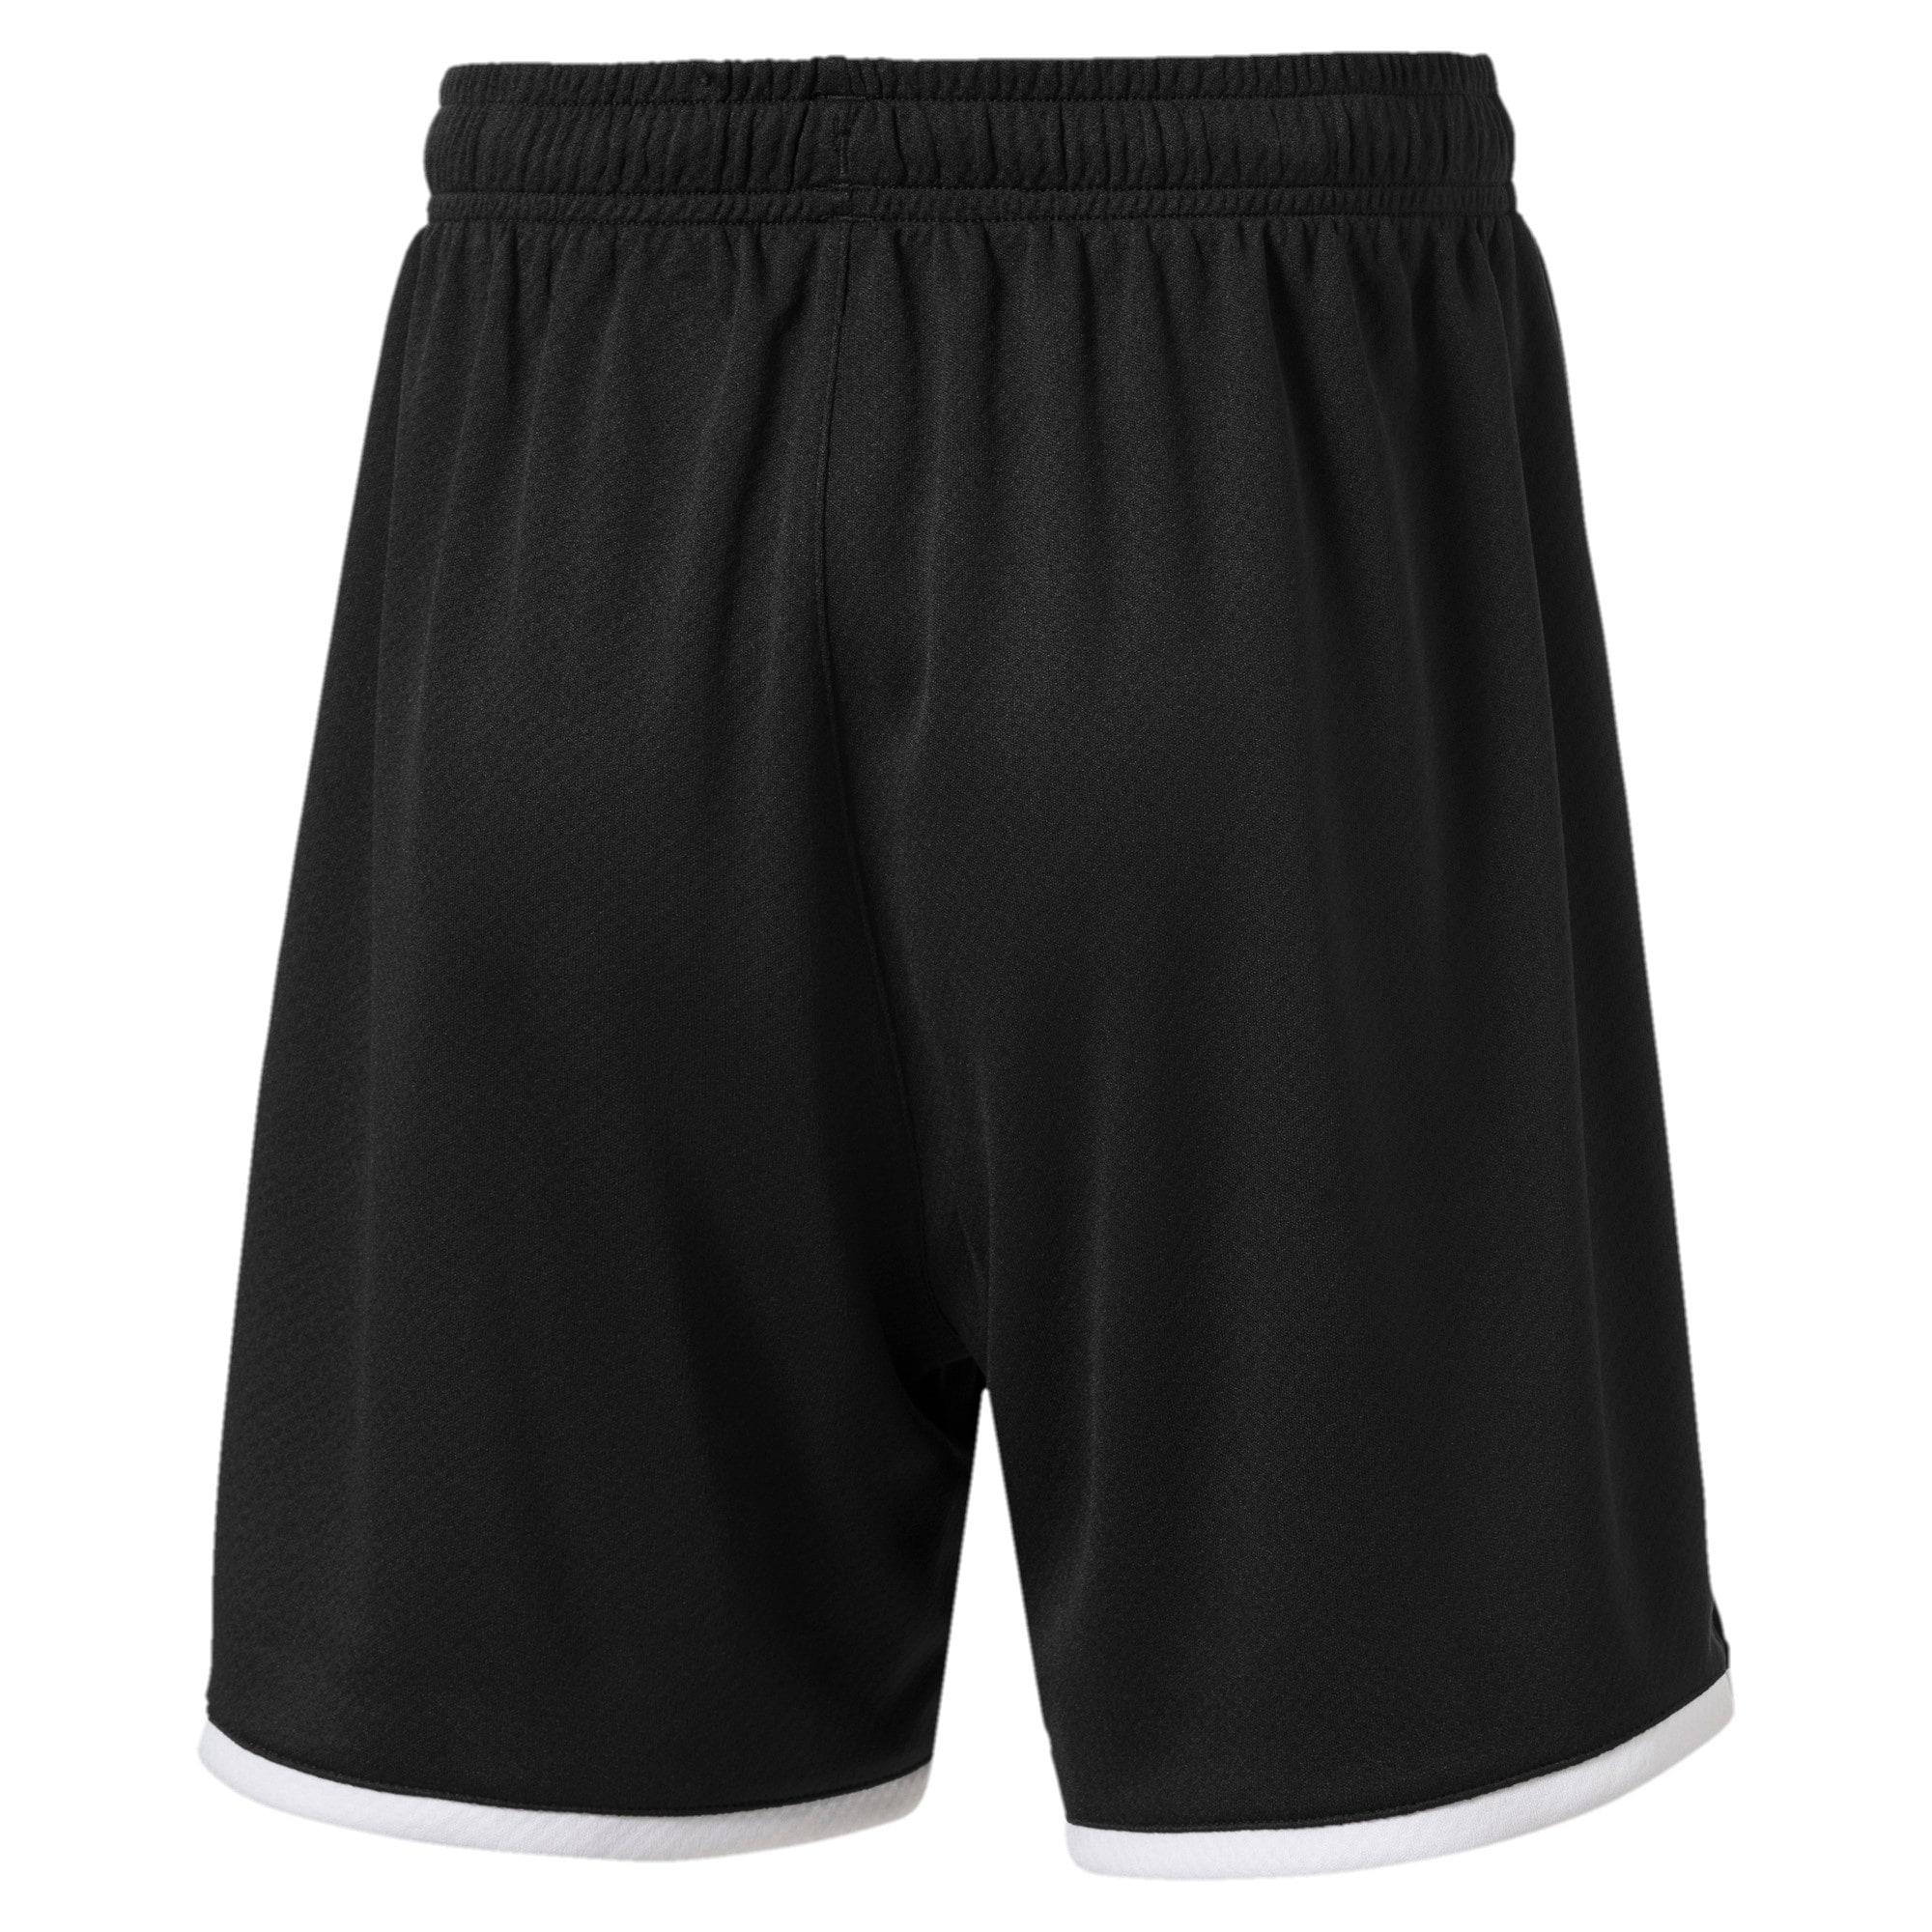 Thumbnail 2 of Borussia Mönchengladbach Boys' Replica Shorts, Puma Black, medium